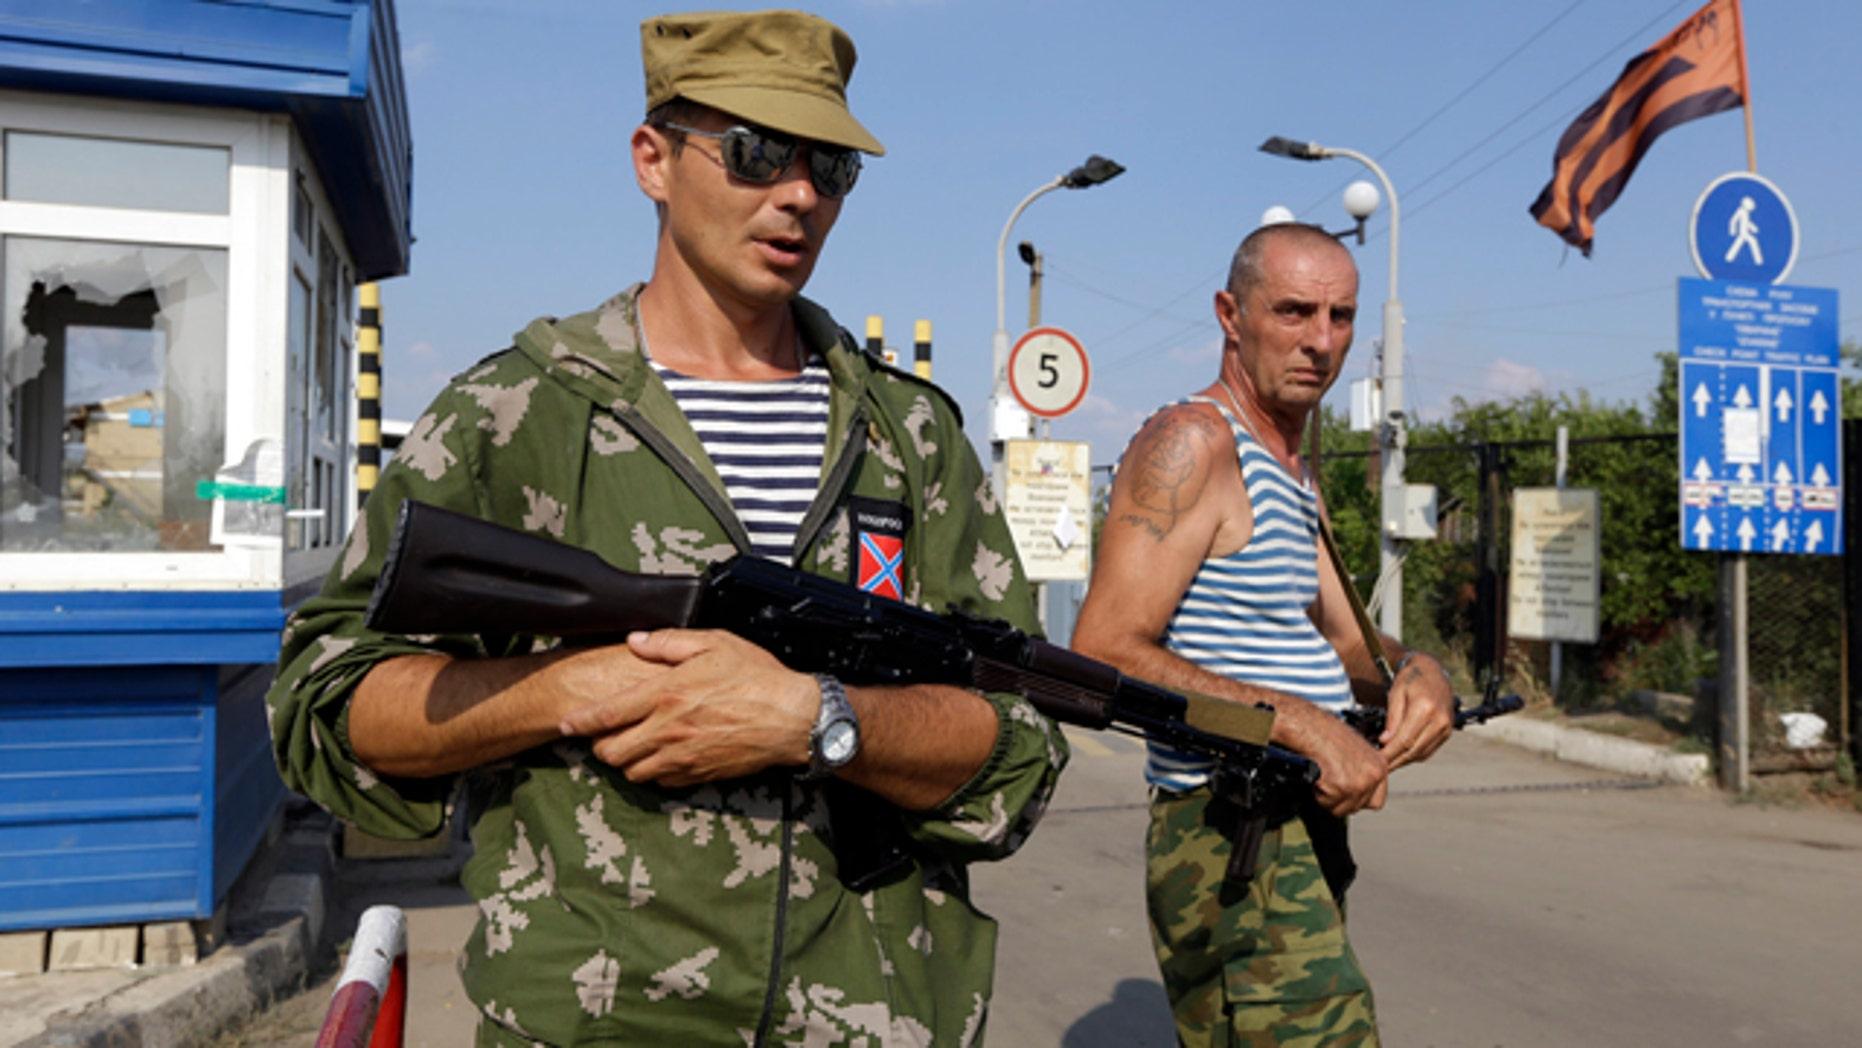 August 16, 2014: Pro-Russian rebels guard a border crossing point 'Izvaryne' on Ukraine-Russia border. (AP Photo/Sergei Grits)